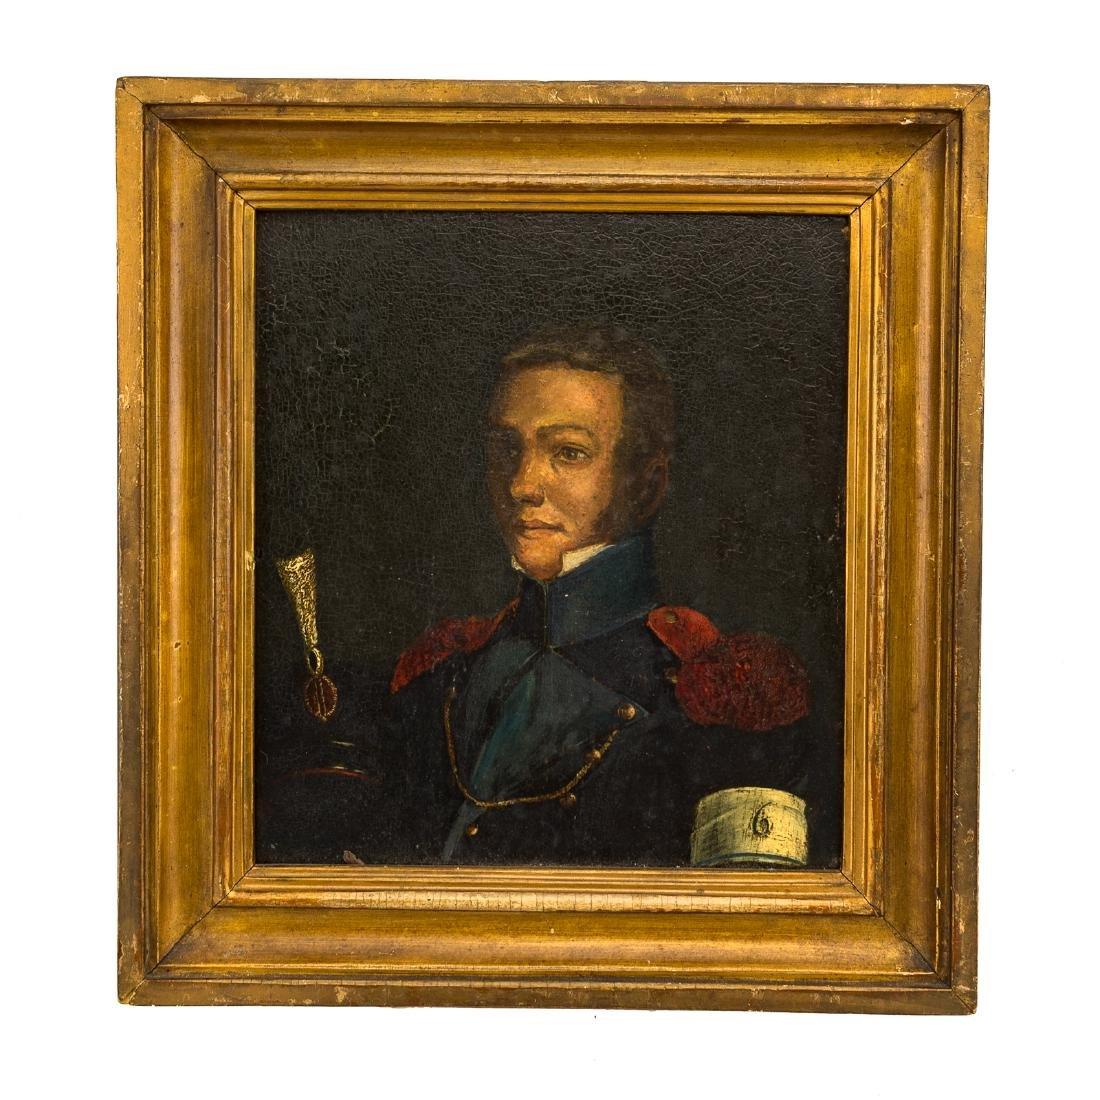 Framed oil on board of a military officer